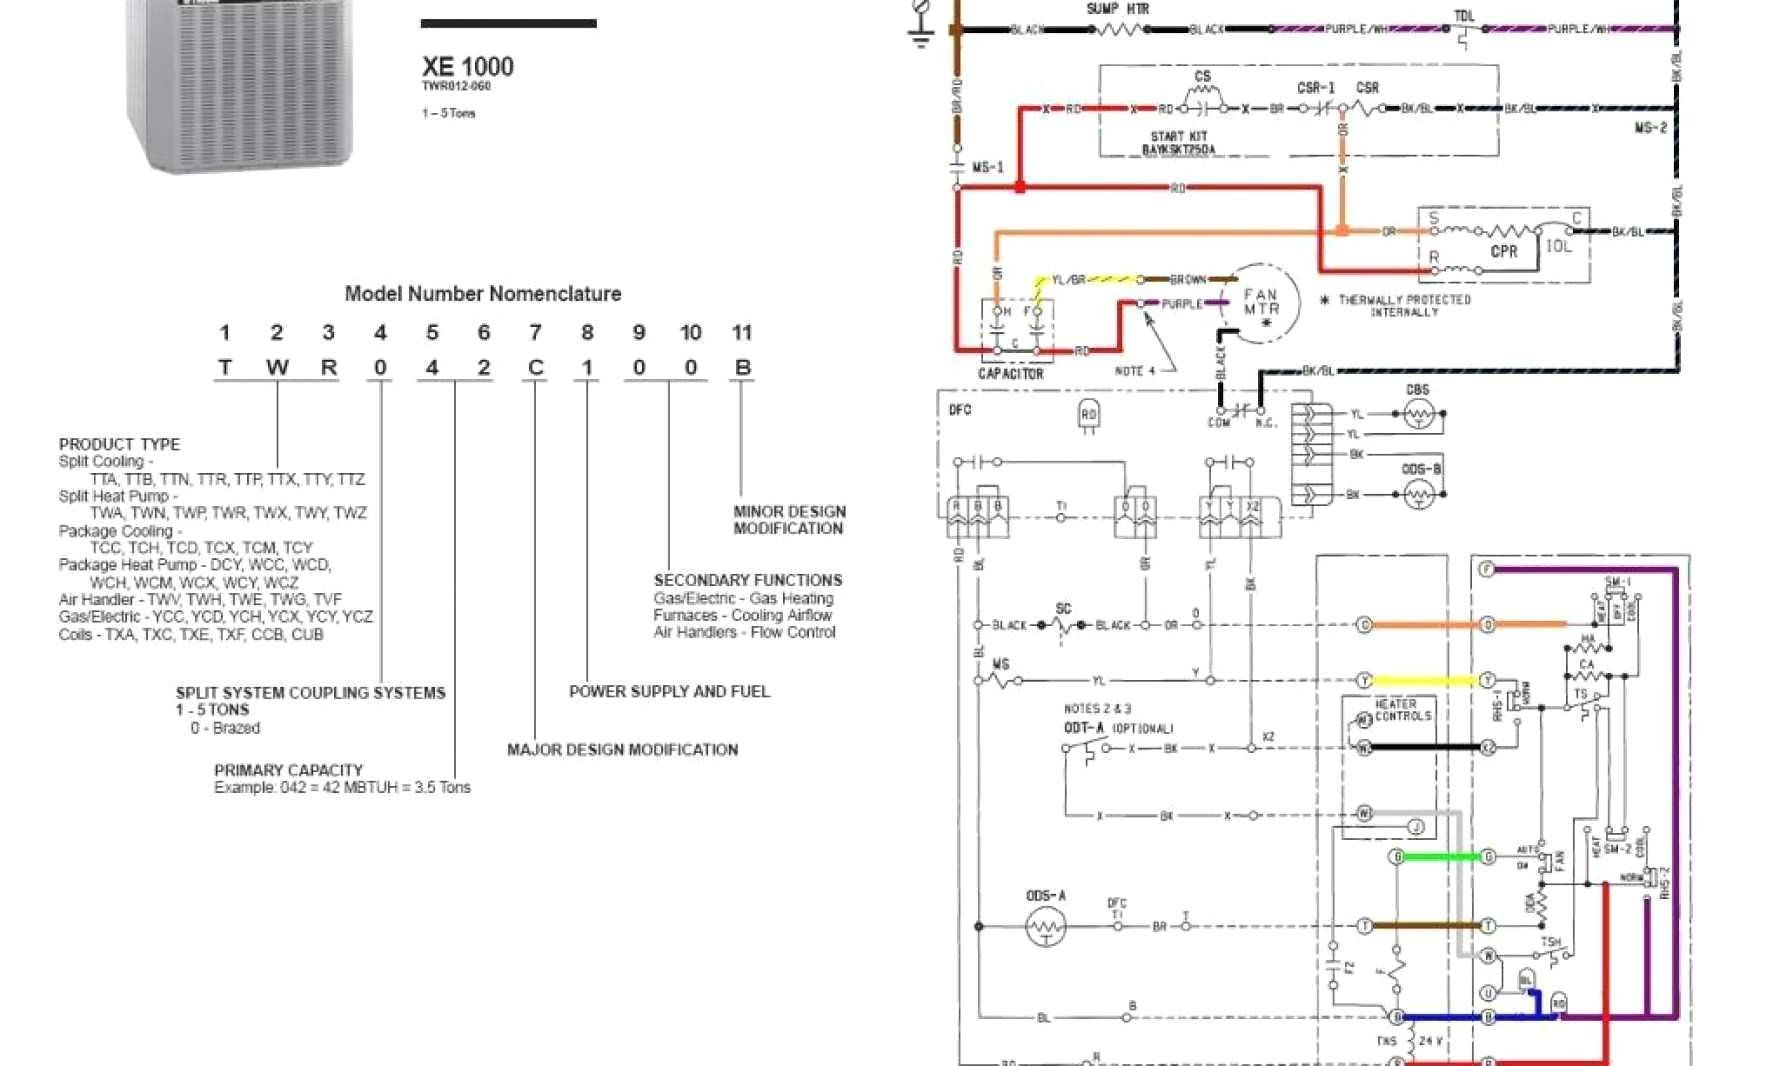 Trane Wiring Diagram | Schematic Diagram - Trane Thermostat Wiring Diagram